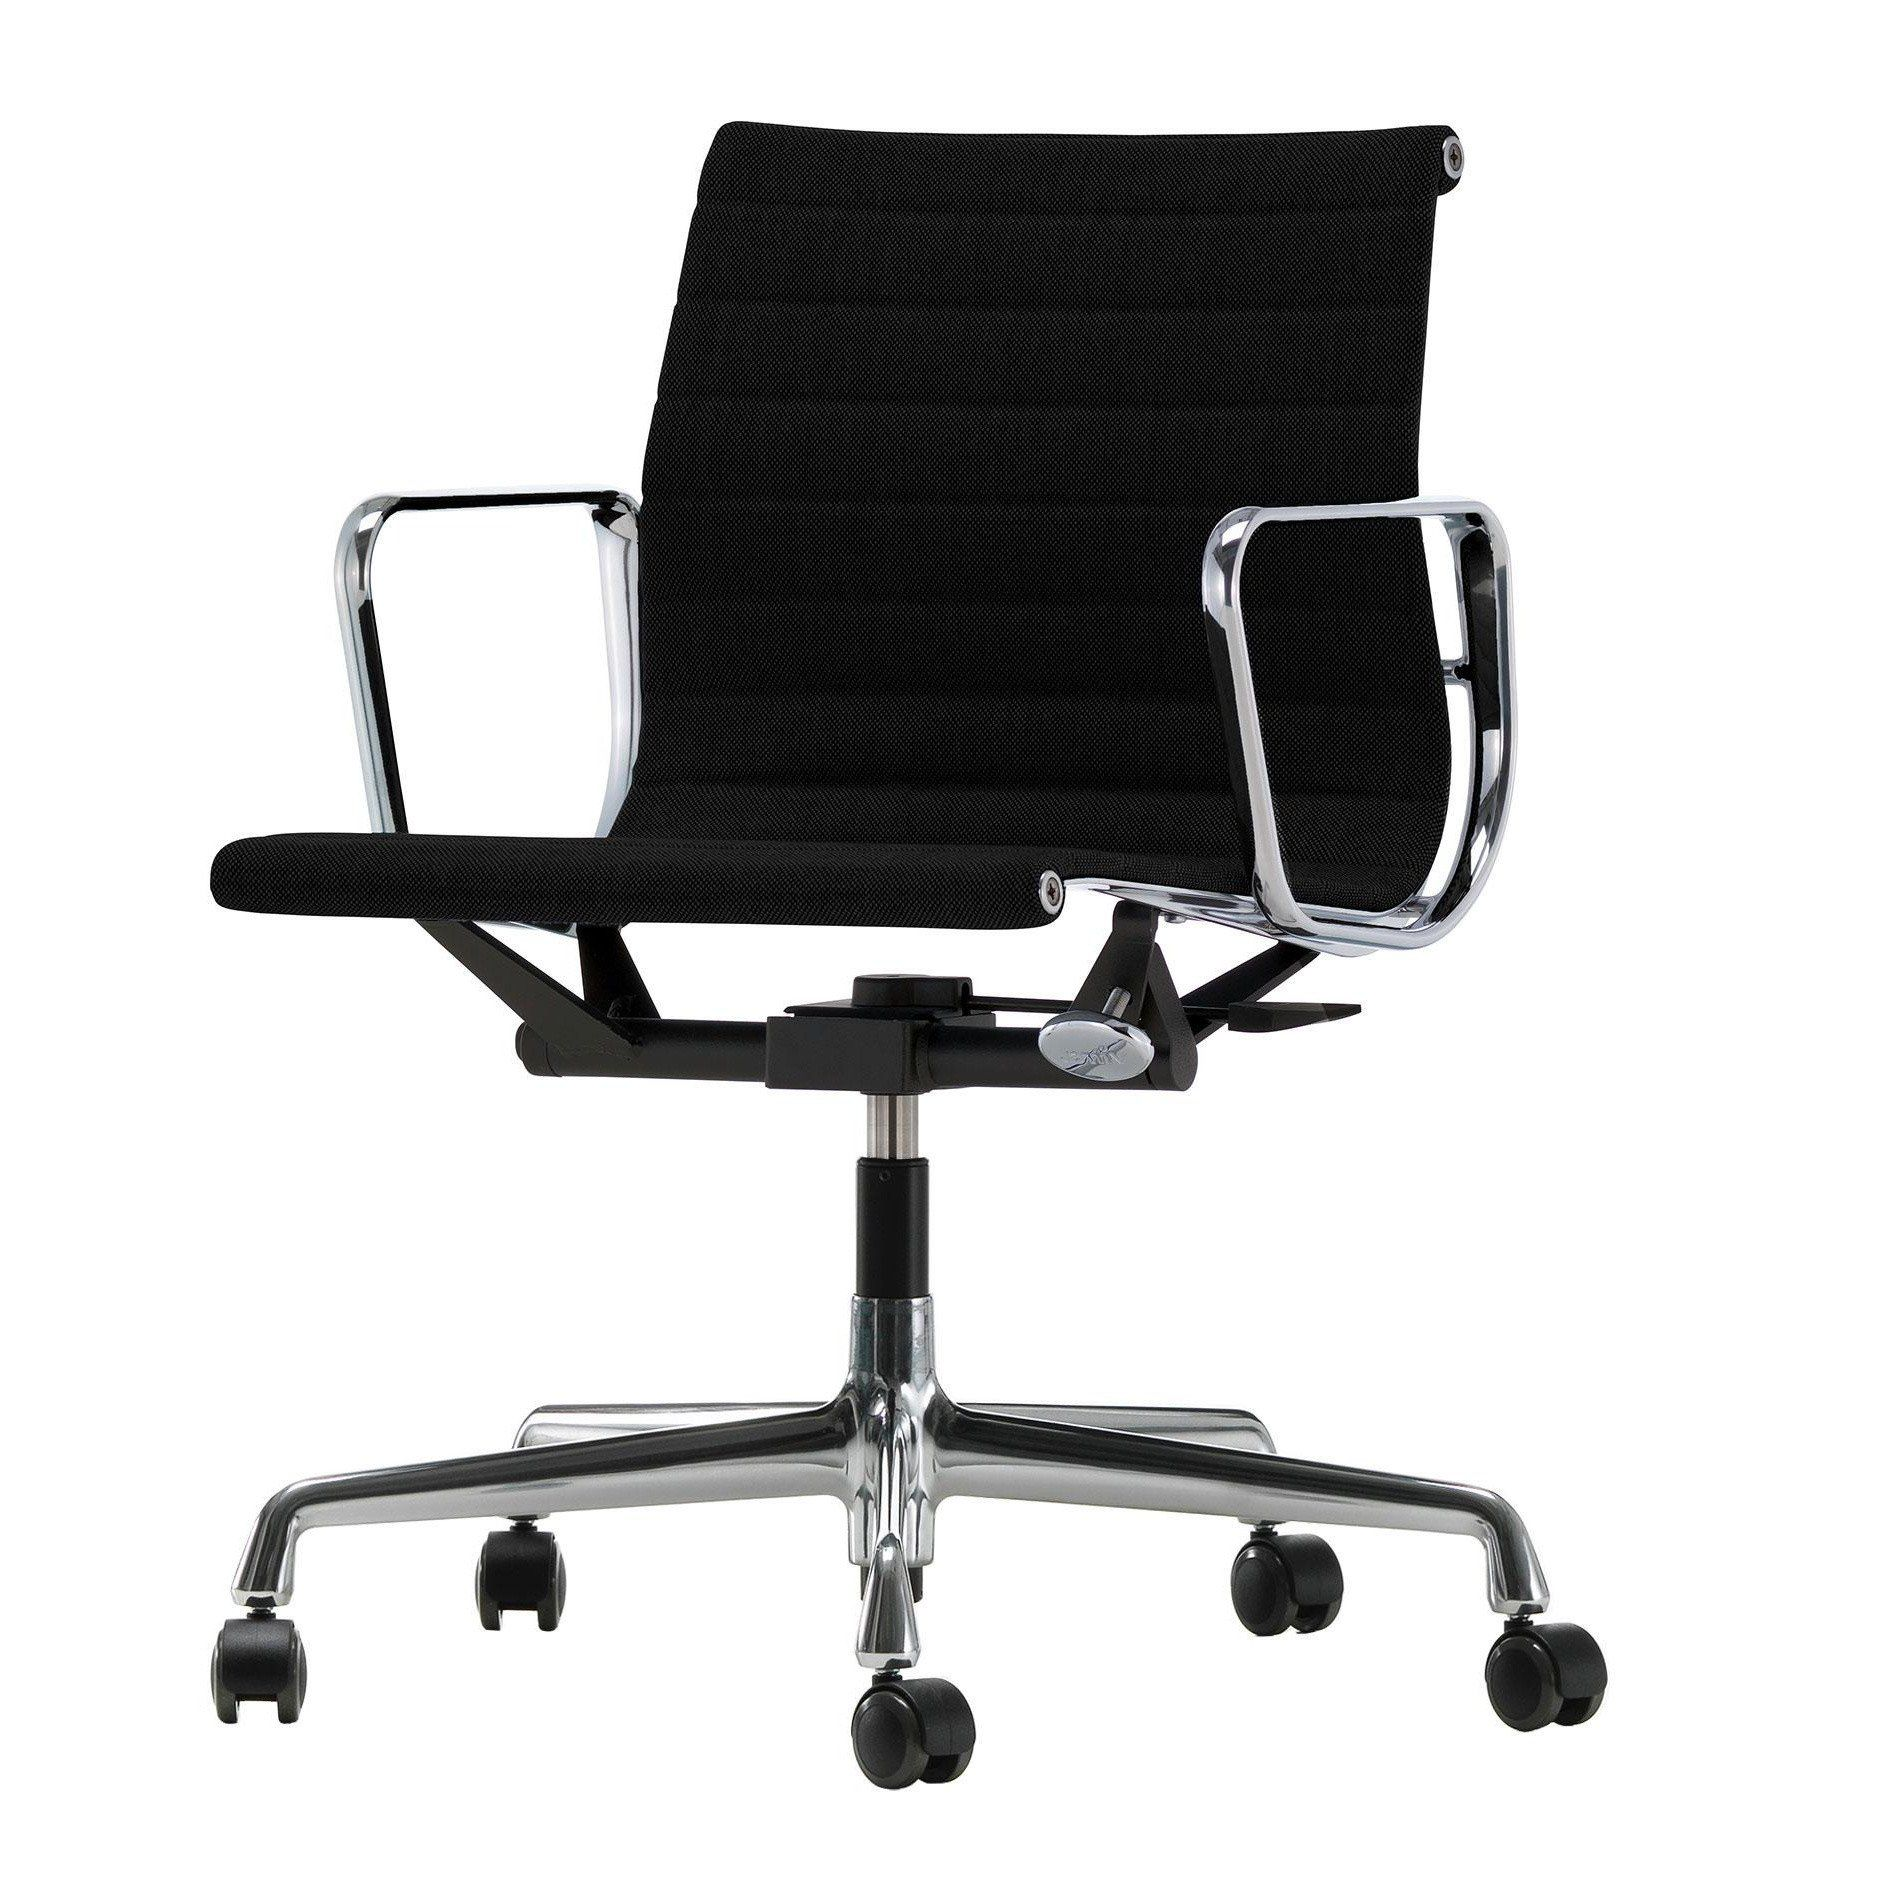 ea 117 alu chair chaise de bureau struct poli vitra. Black Bedroom Furniture Sets. Home Design Ideas